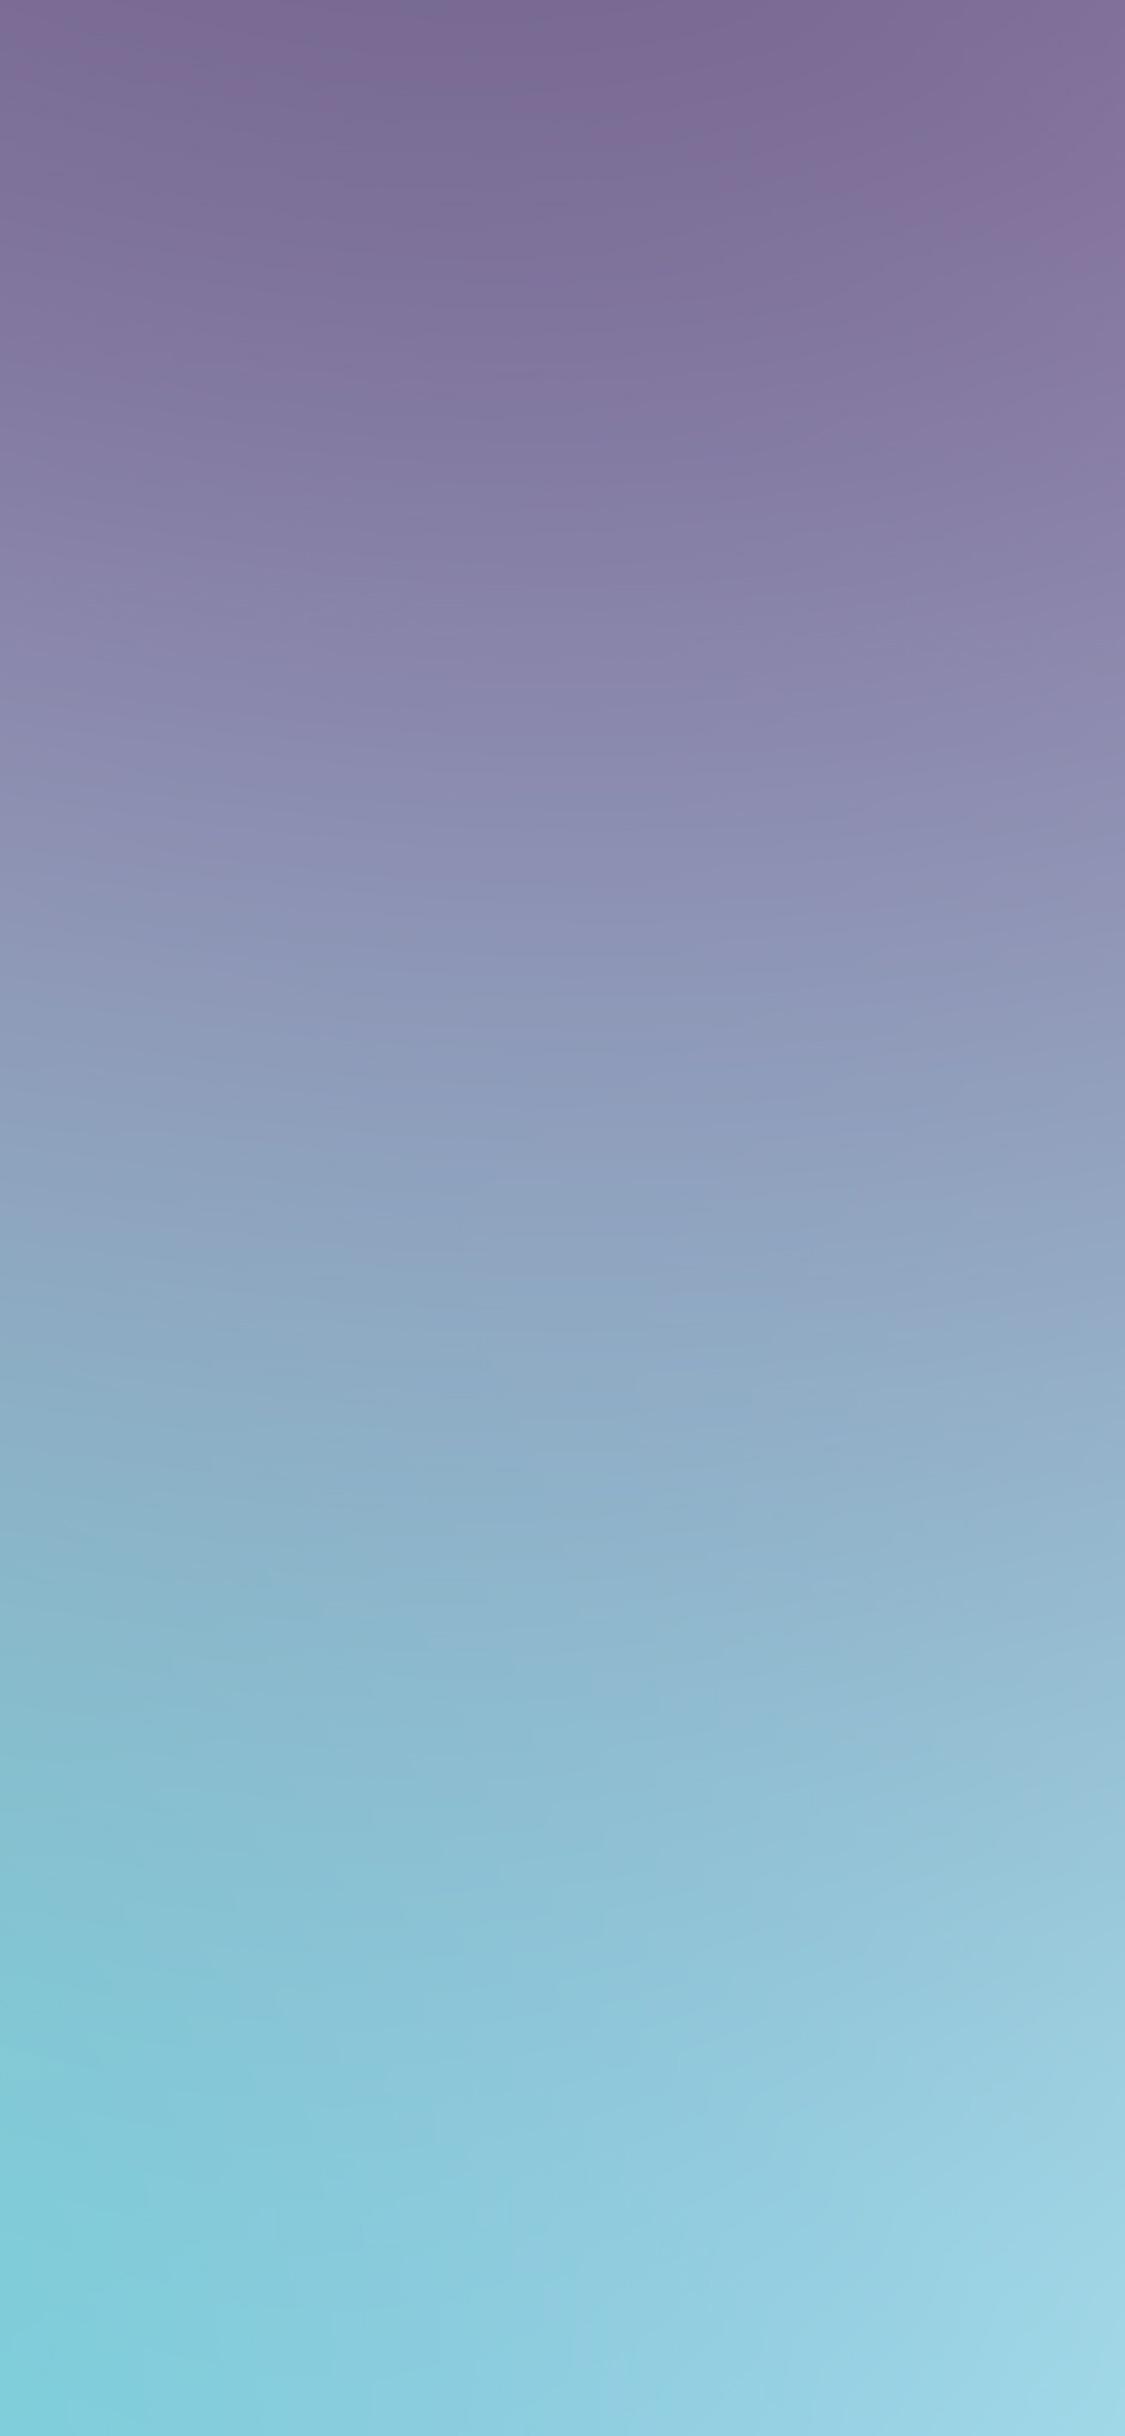 iPhoneXpapers.com-Apple-iPhone-wallpaper-sg81-soft-facial-tissues-gradation-blur